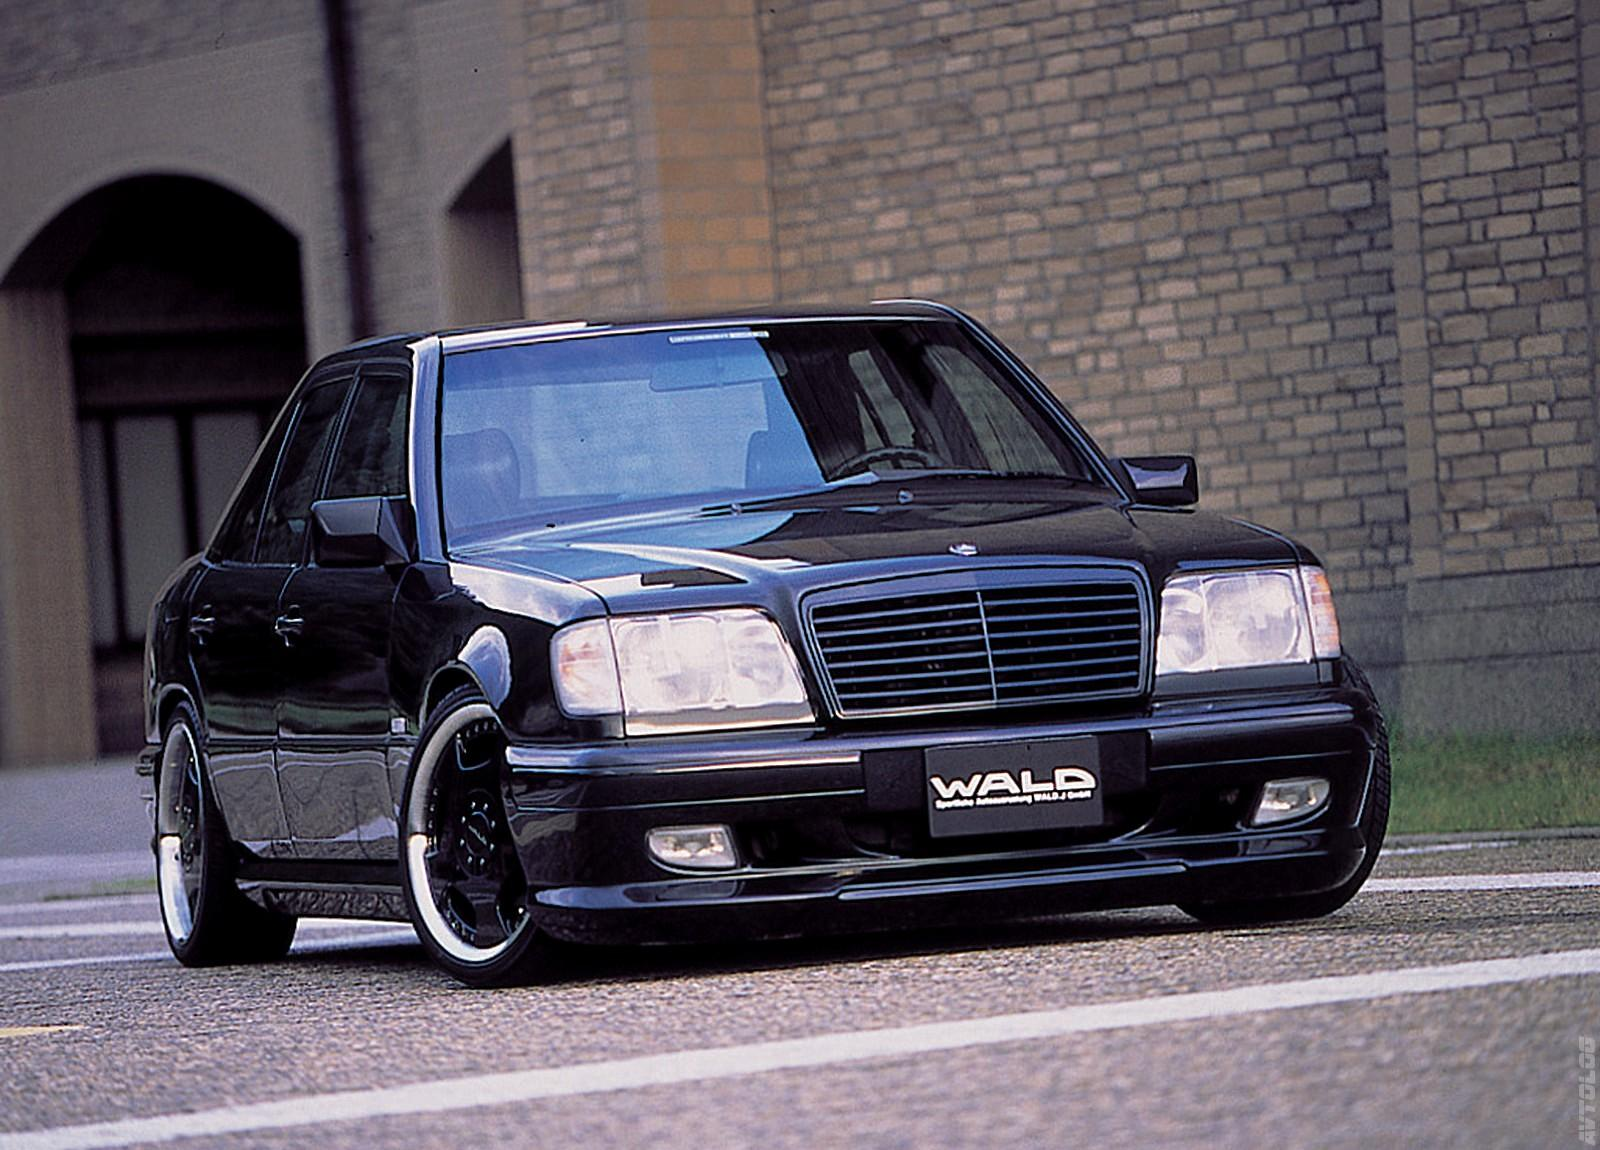 Mercedes benz w124 wallpaper hd download for Video mercedes benz